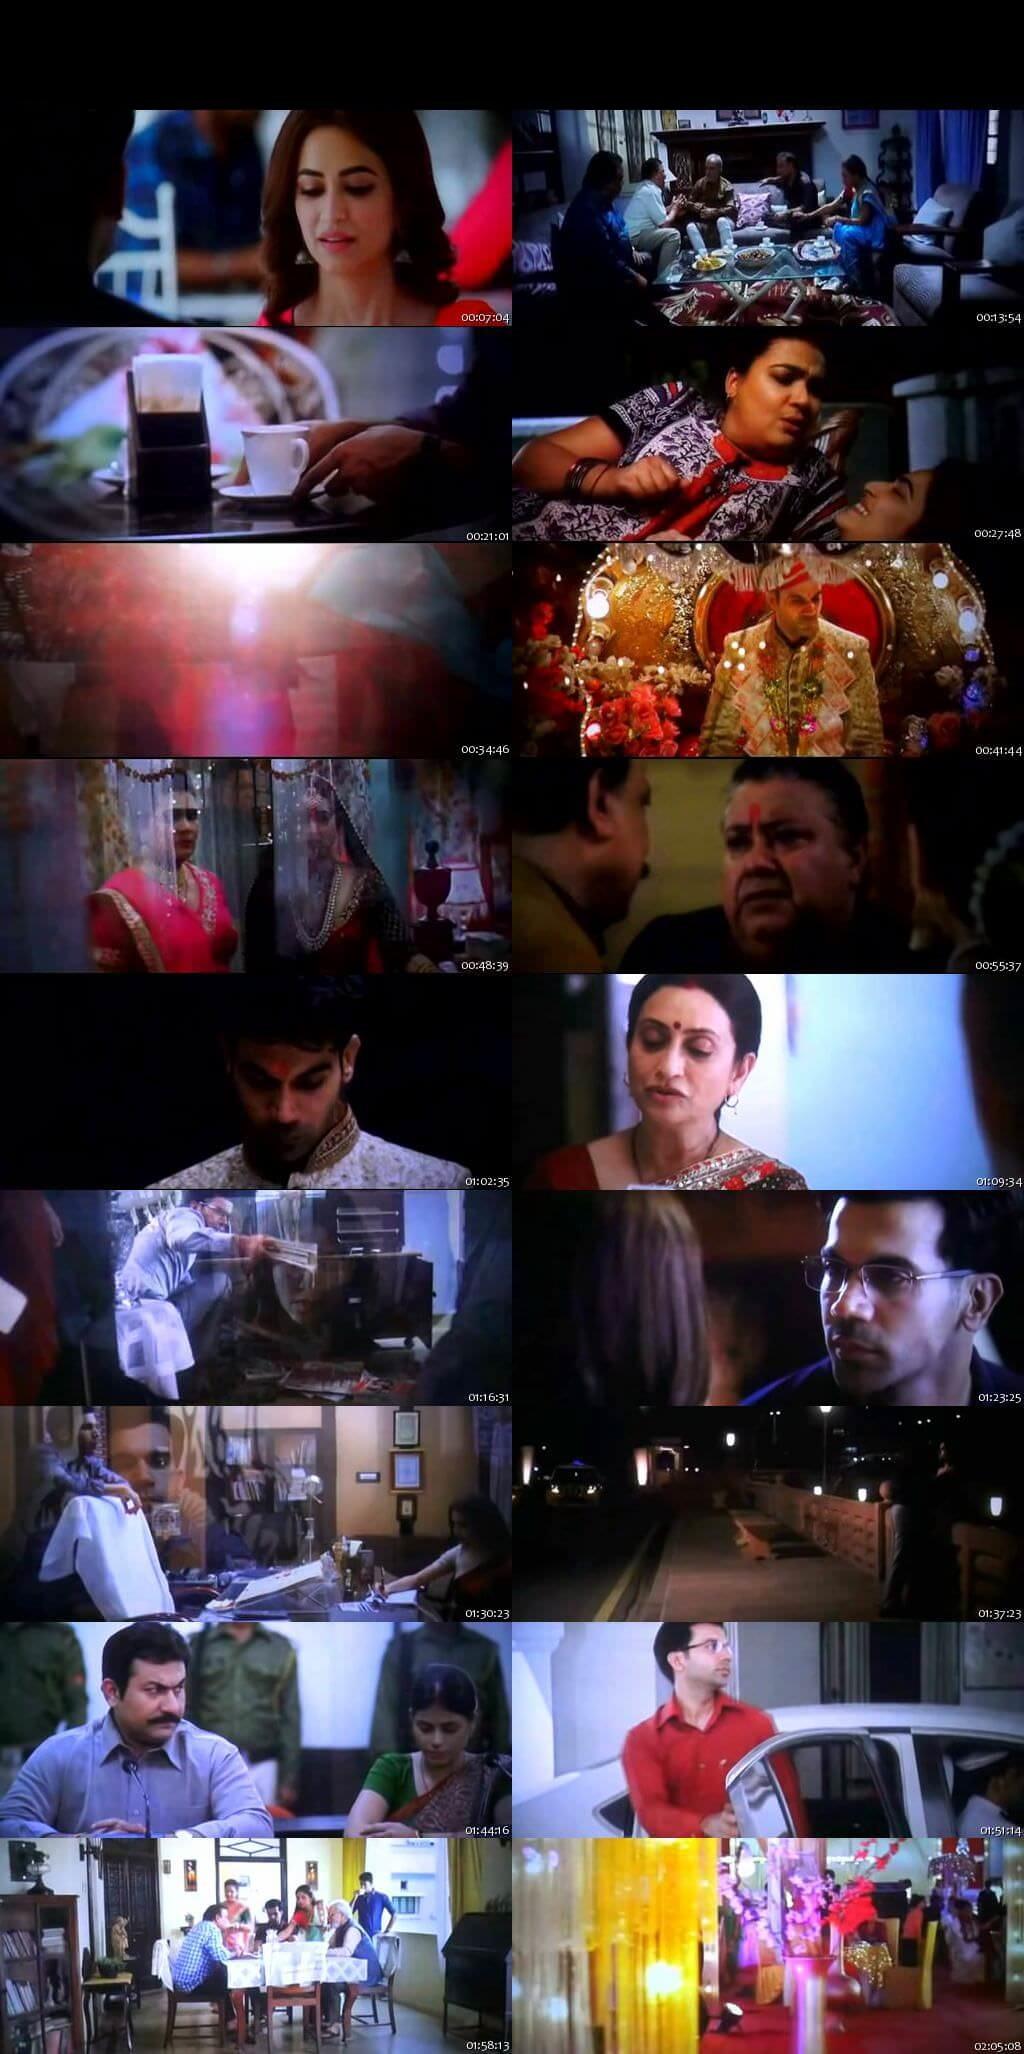 Watch Online Shaadi Mein Zaroor Aana 2017 100MB Full Movie Free Download For Mobiles PdvdRip 3GP Mp4 HEVC